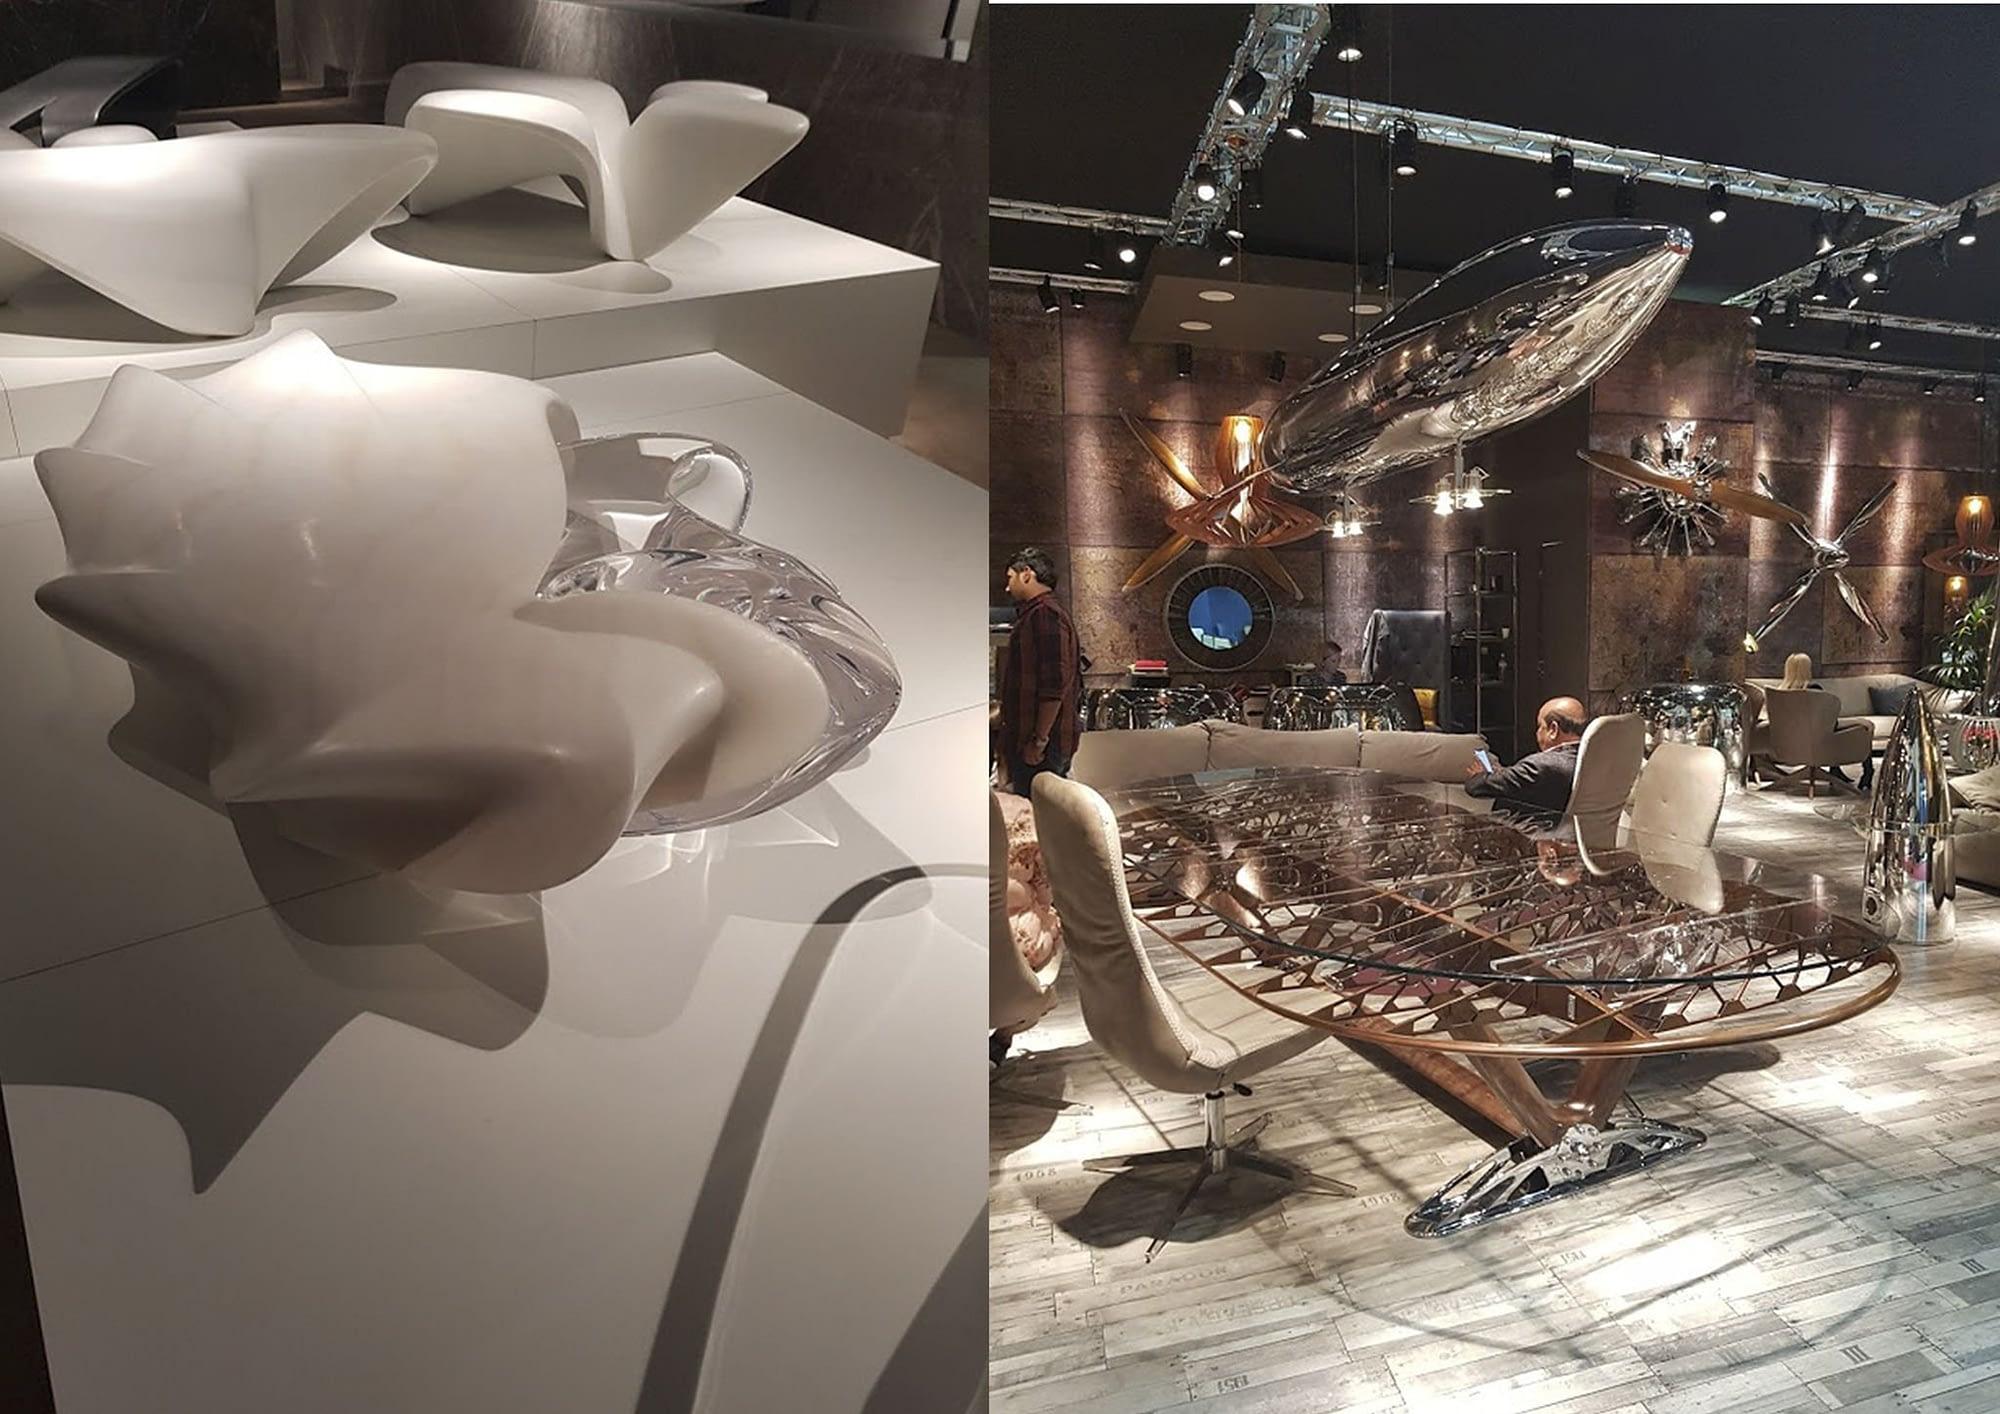 Milano Design Week 2018 - Salone del Mobile 26